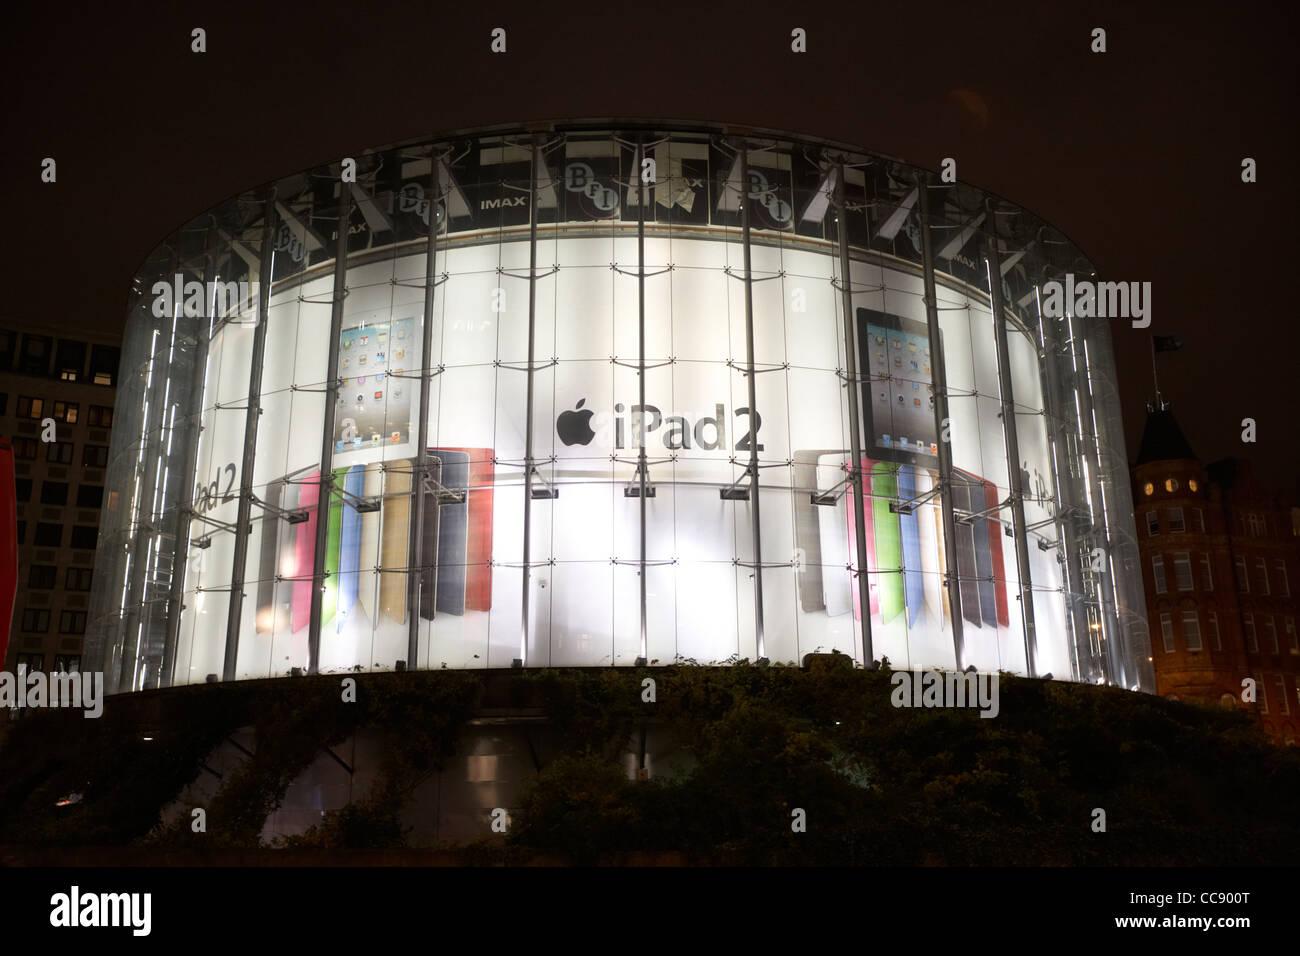 BFI Imax cinema on the south bank London with ipad 2 advert England UK United kingdom - Stock Image